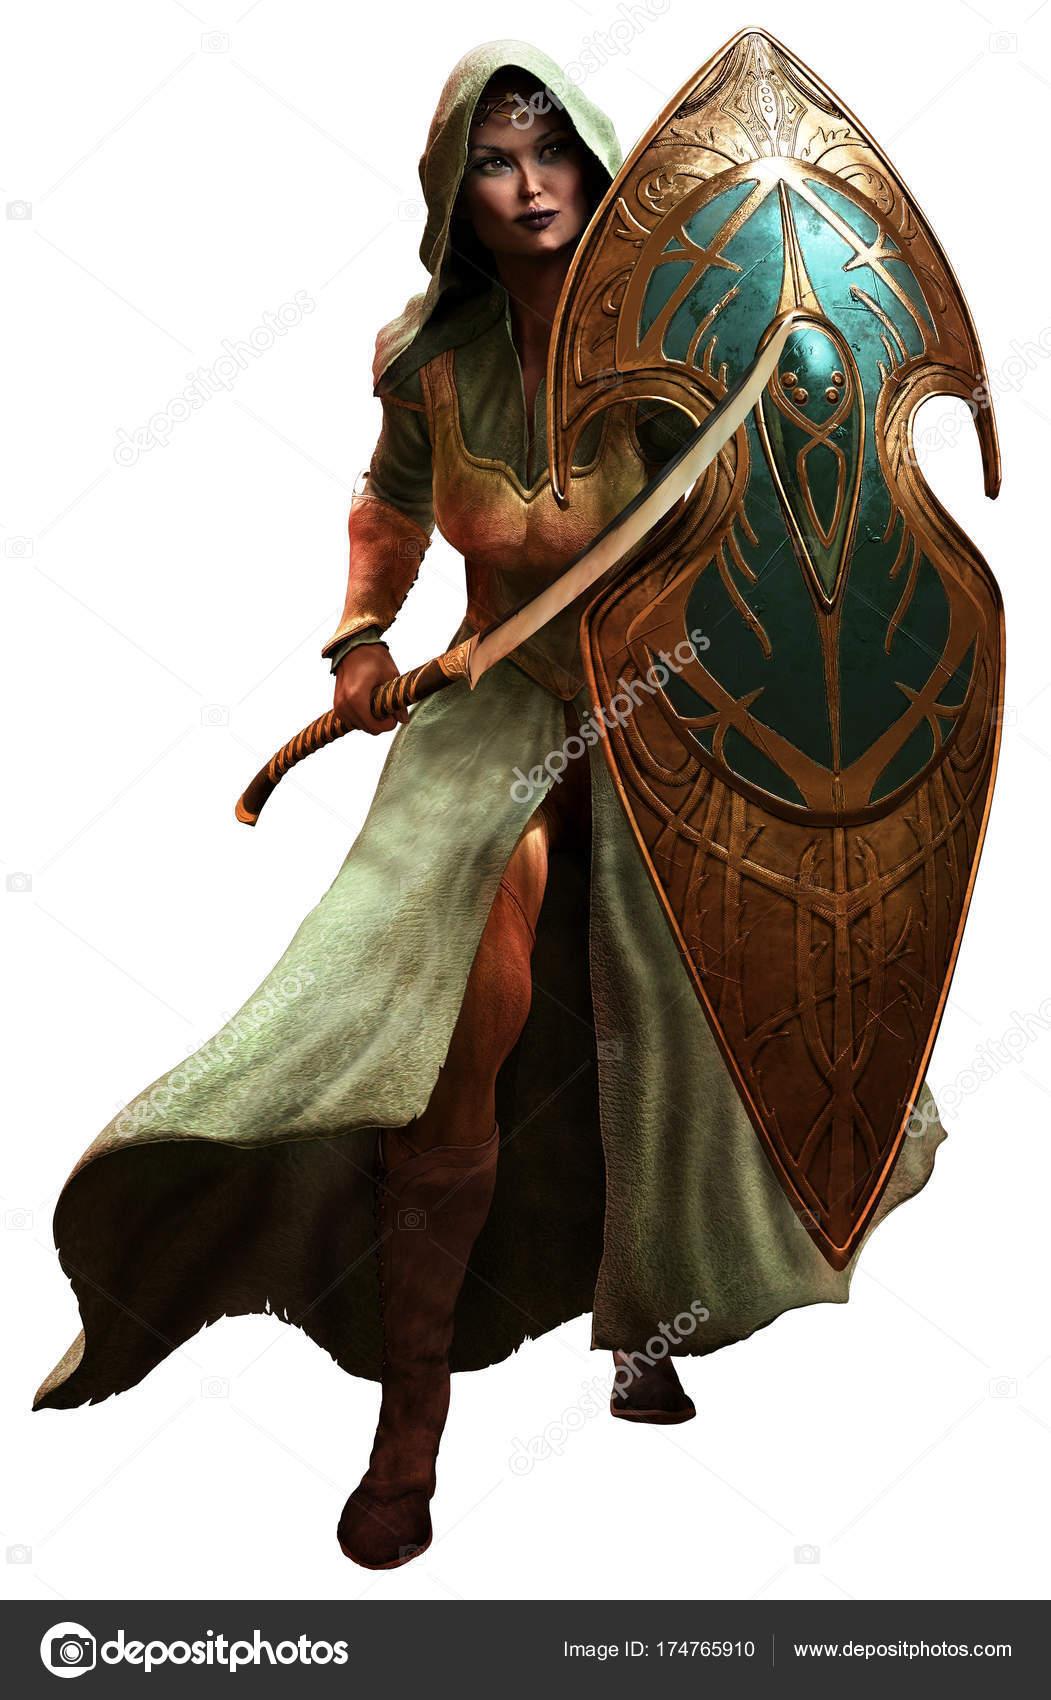 [Aventura]: Os Escolhidos - Página 20 Depositphotos_174765910-stock-photo-elf-warrior-illustration